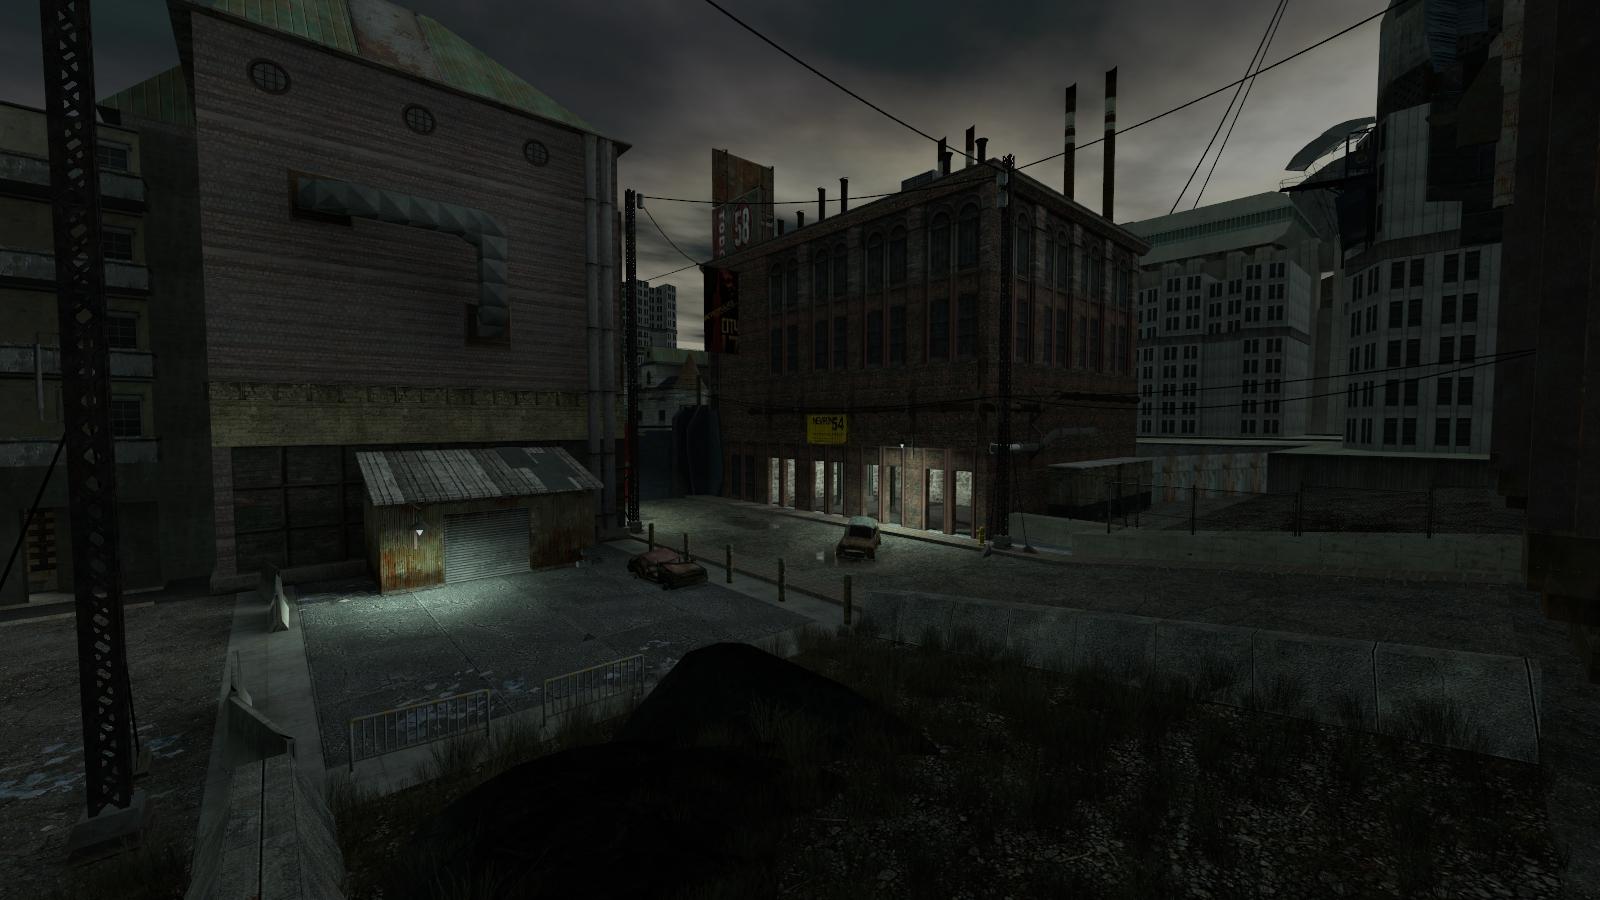 Half-Life 2. Dark Interval [MOD] - Half-Life 2 Арт, Мод, Скриншот